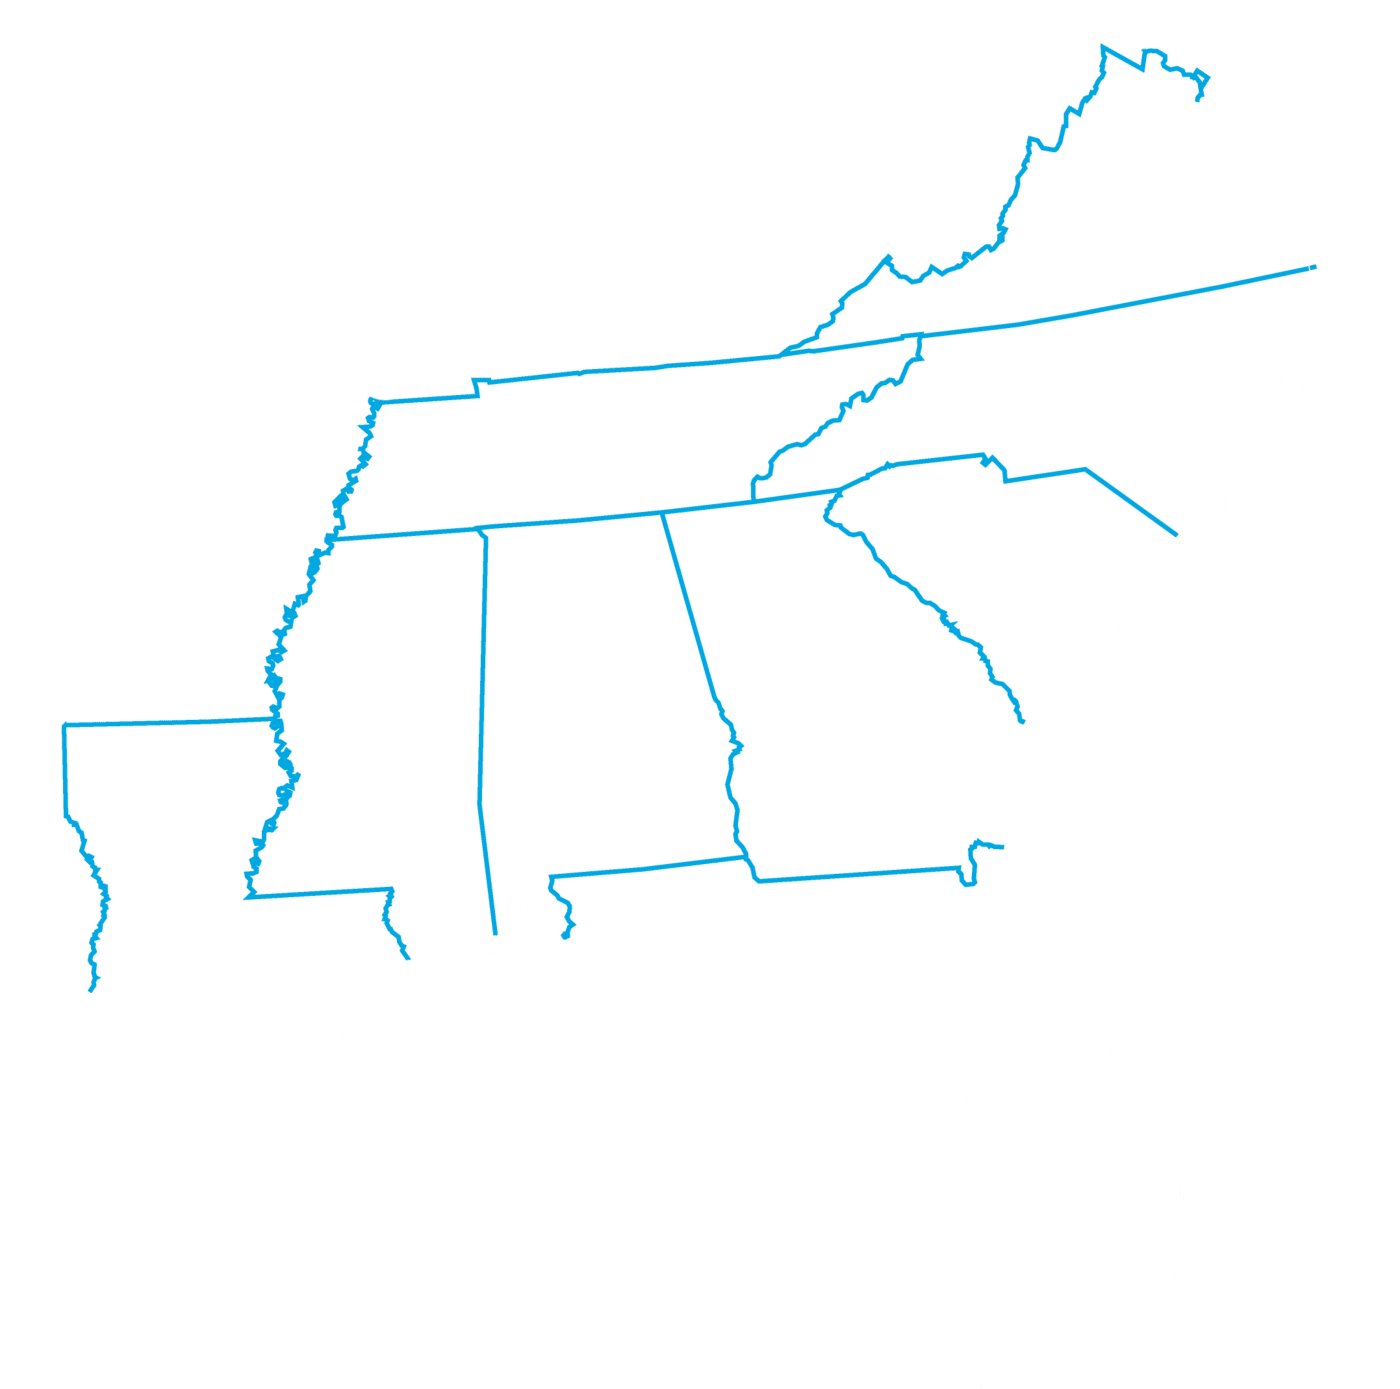 East coast_9 states_white inverse